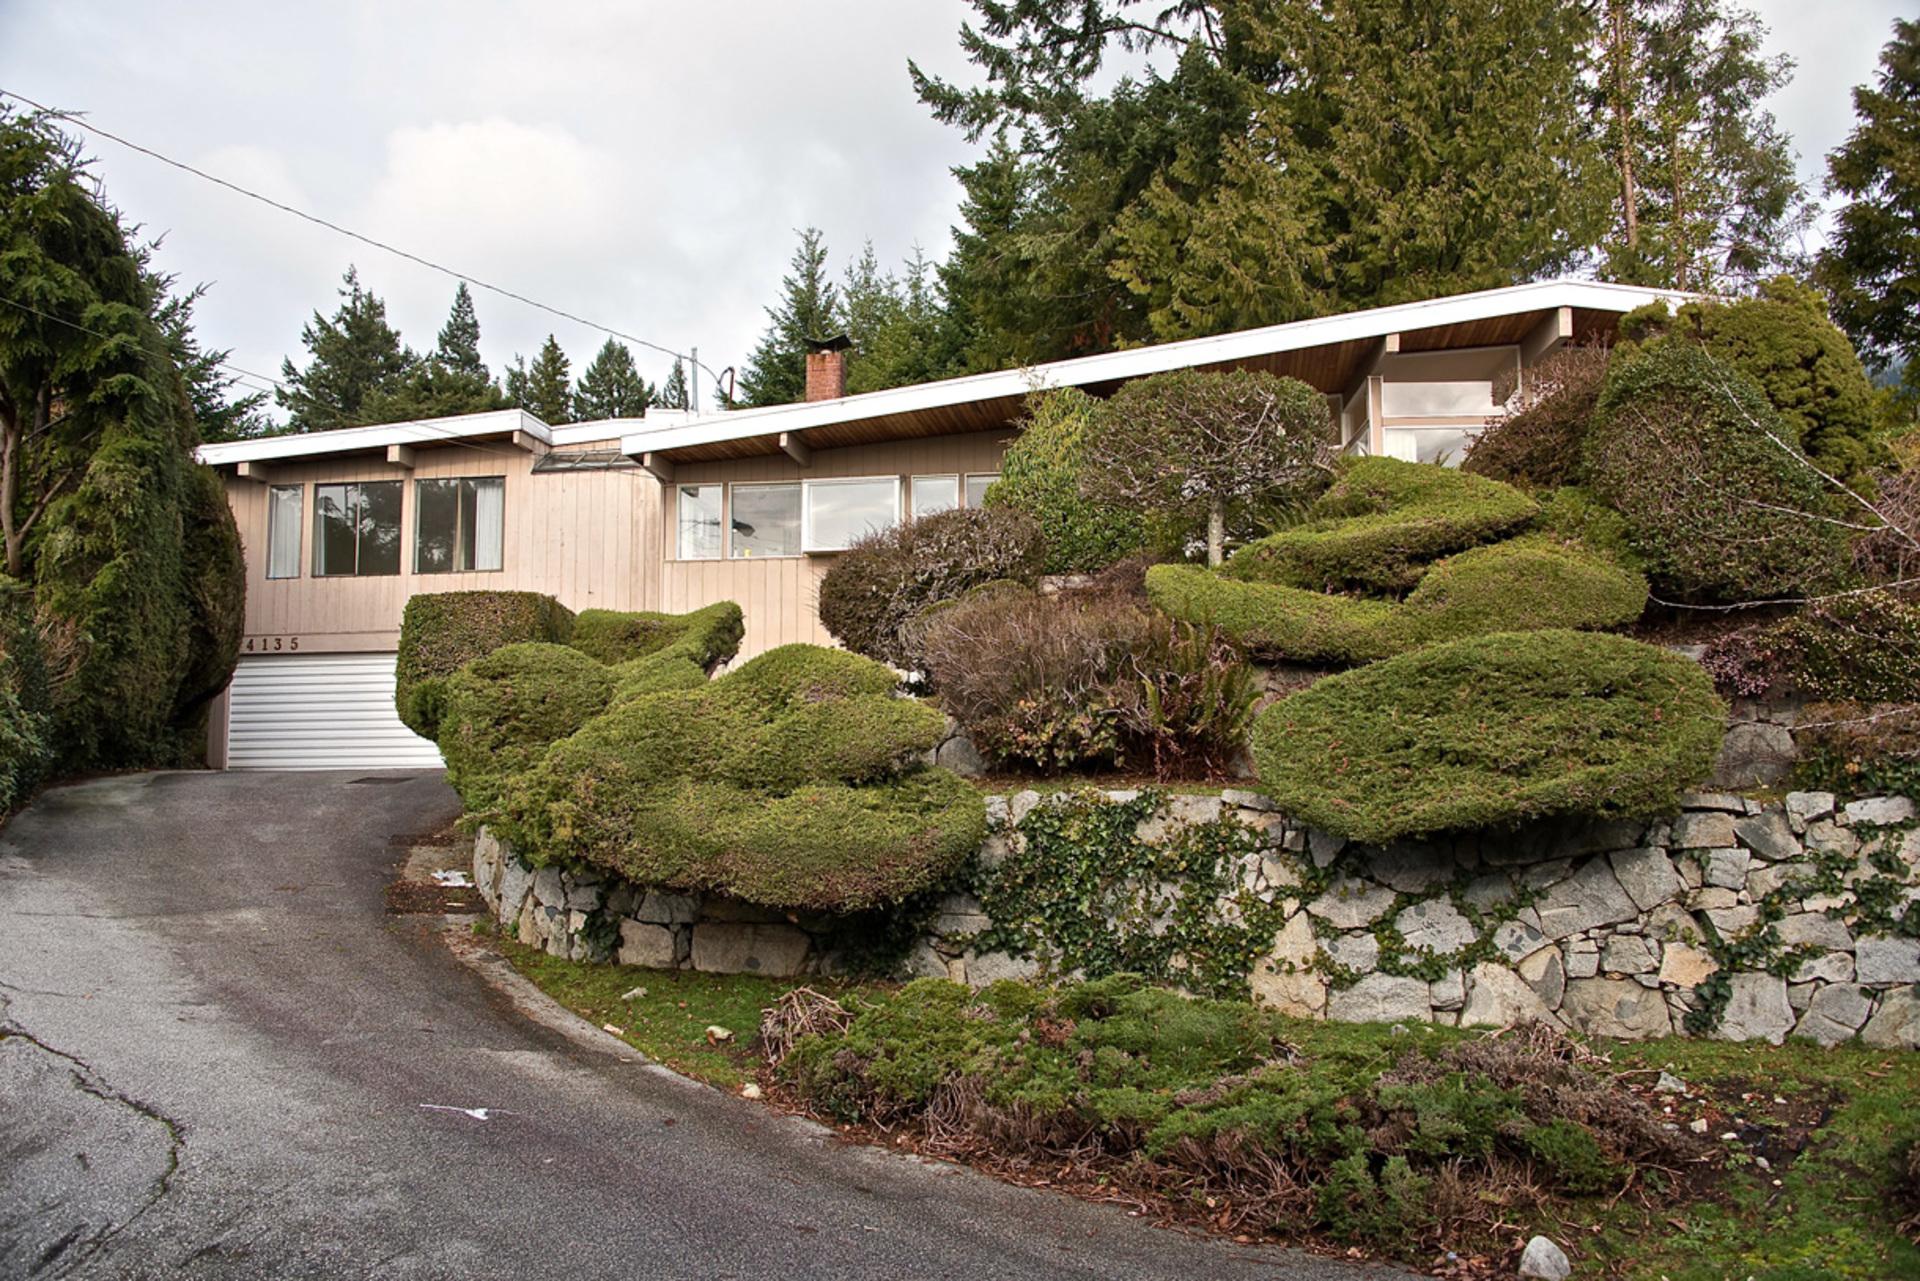 001 at 4135 Burkehill Road, Bayridge, West Vancouver